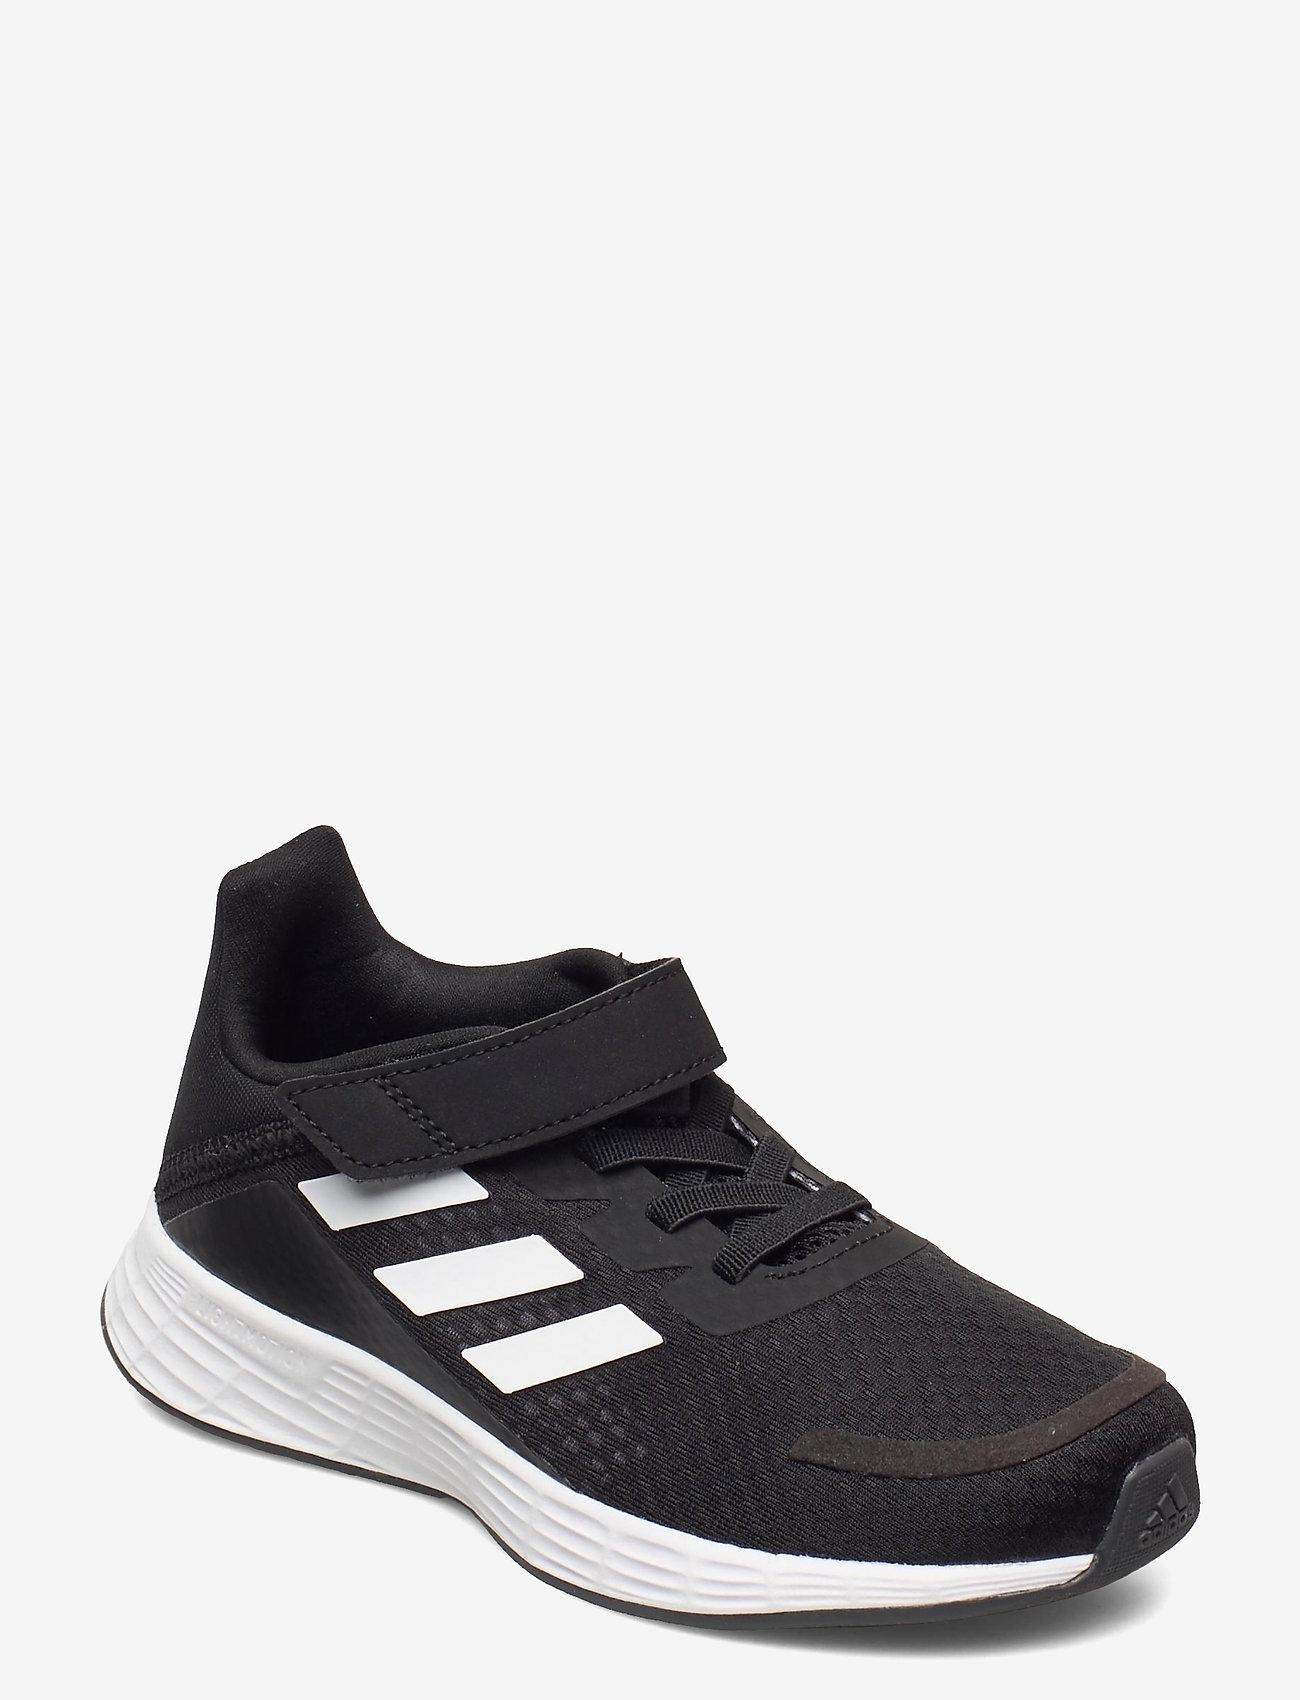 adidas Performance - Duramo SL - trainingsschuhe - cblack/ftwwht/gresix - 0